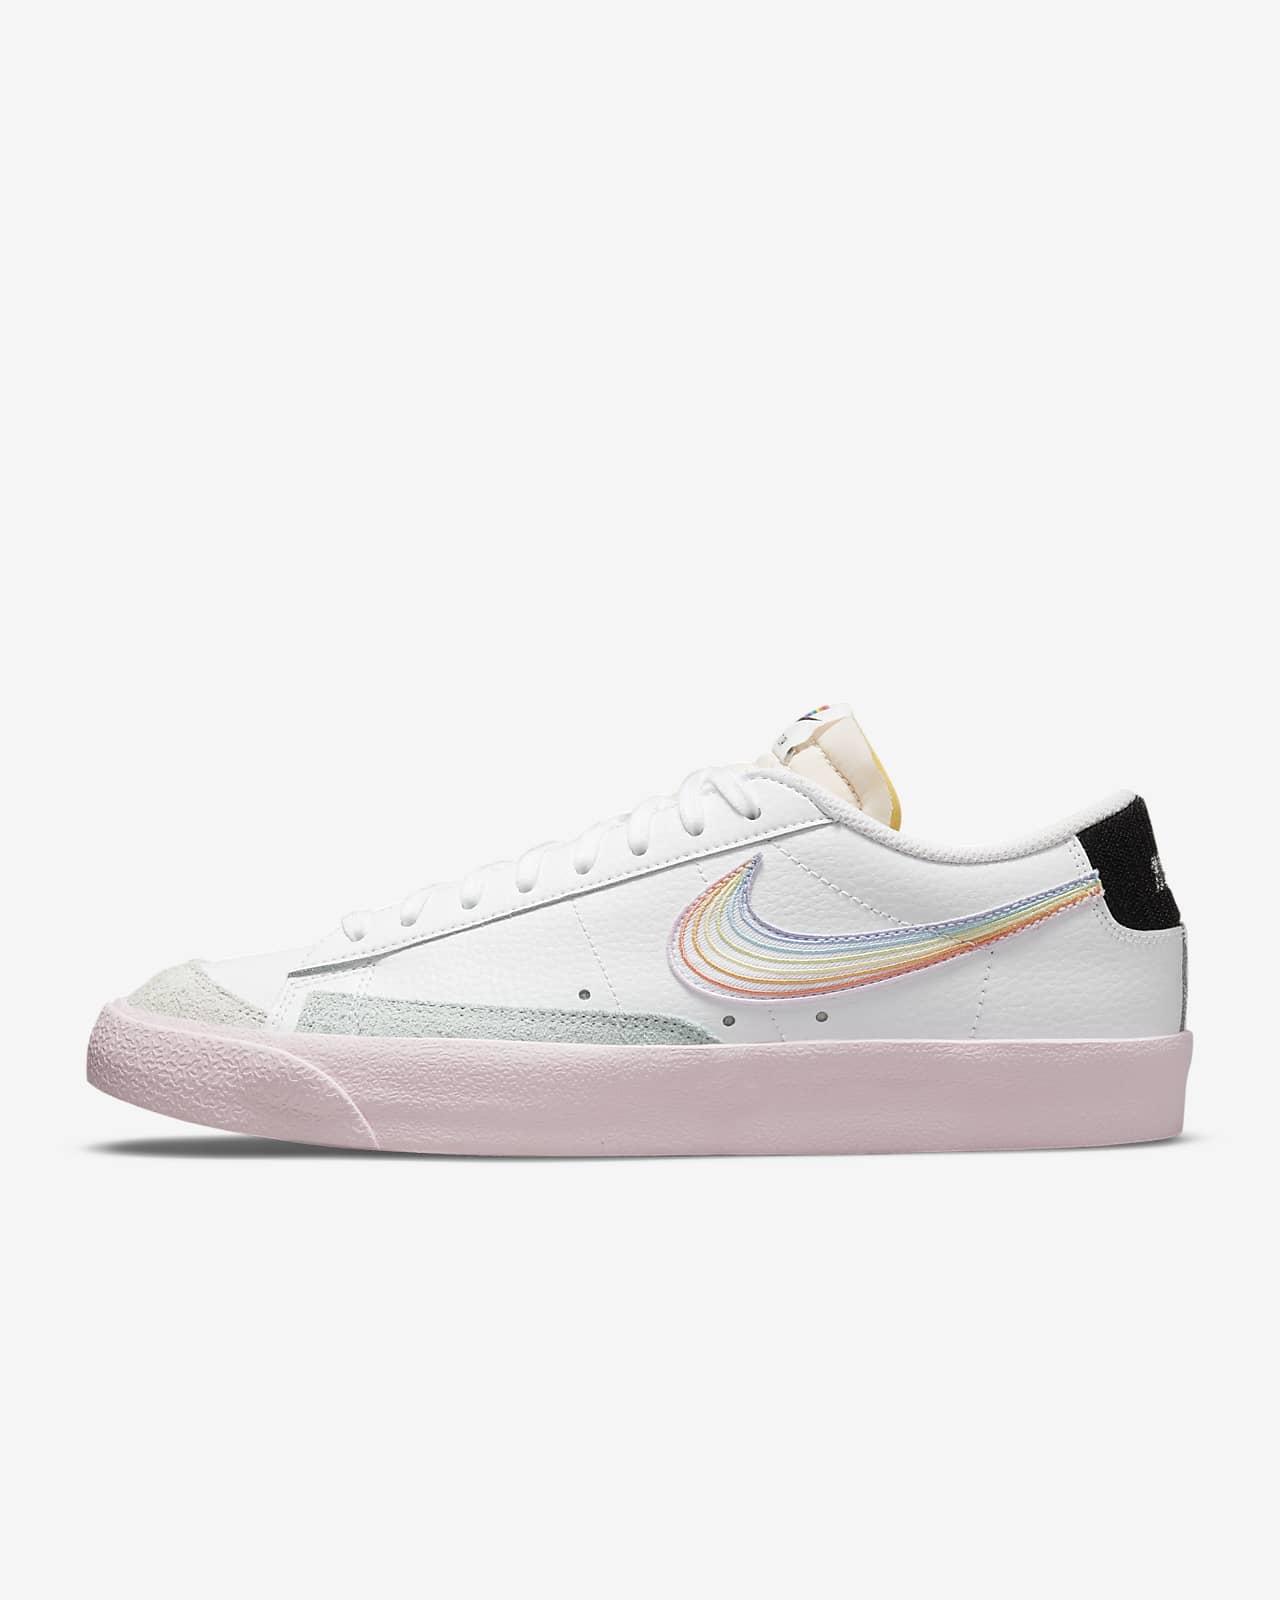 Calzado Nike Blazer Low '77 Vintage Be True